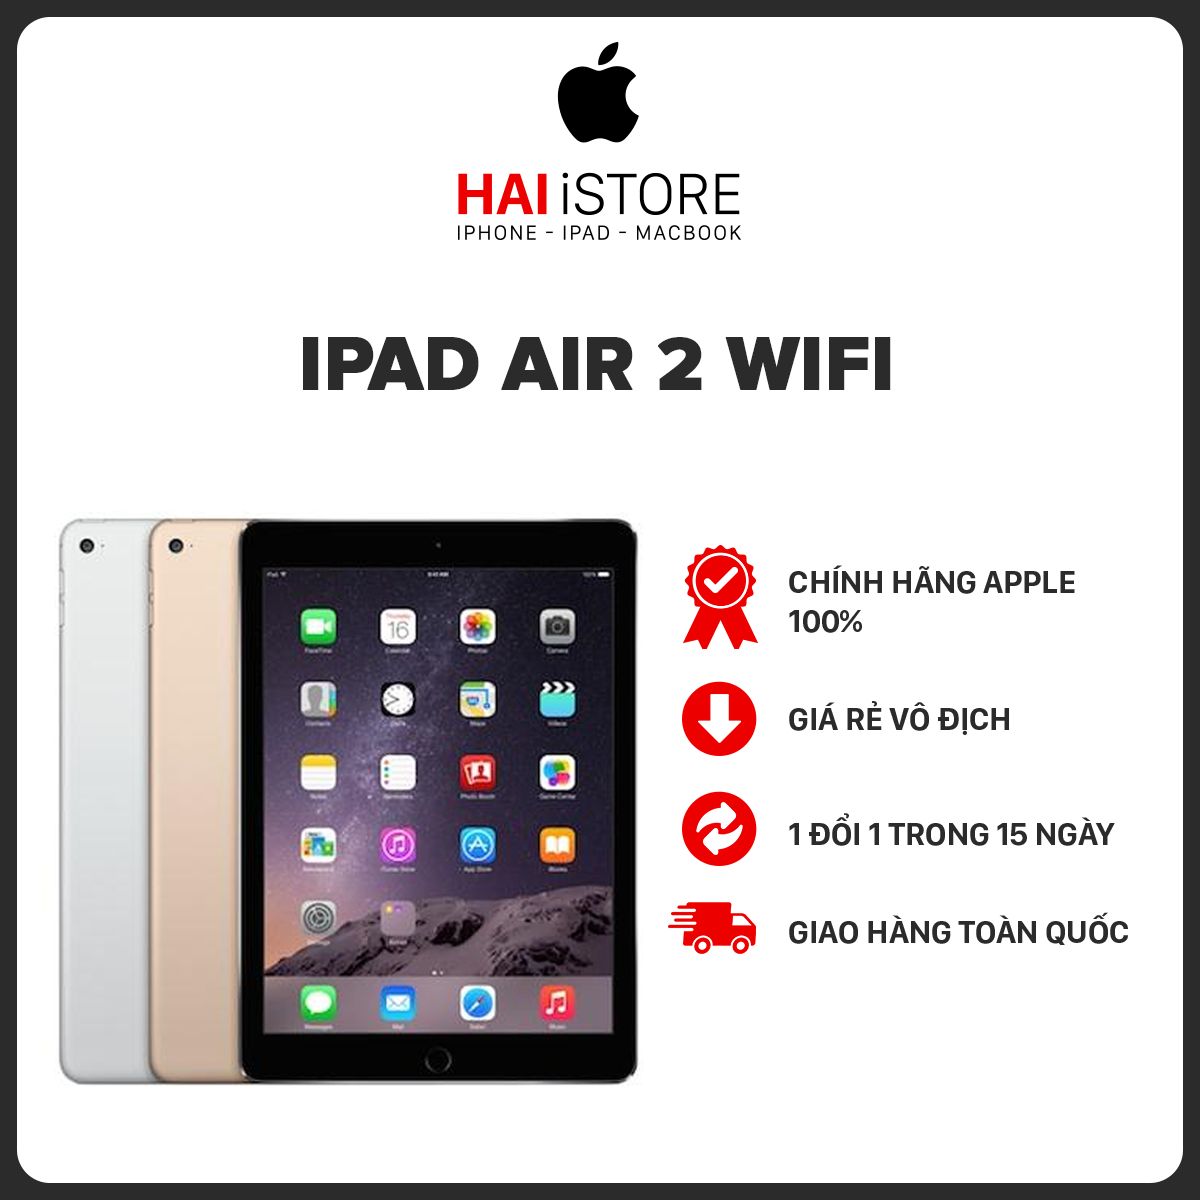 Máy tính bảng IPAD Air 2 WIFI